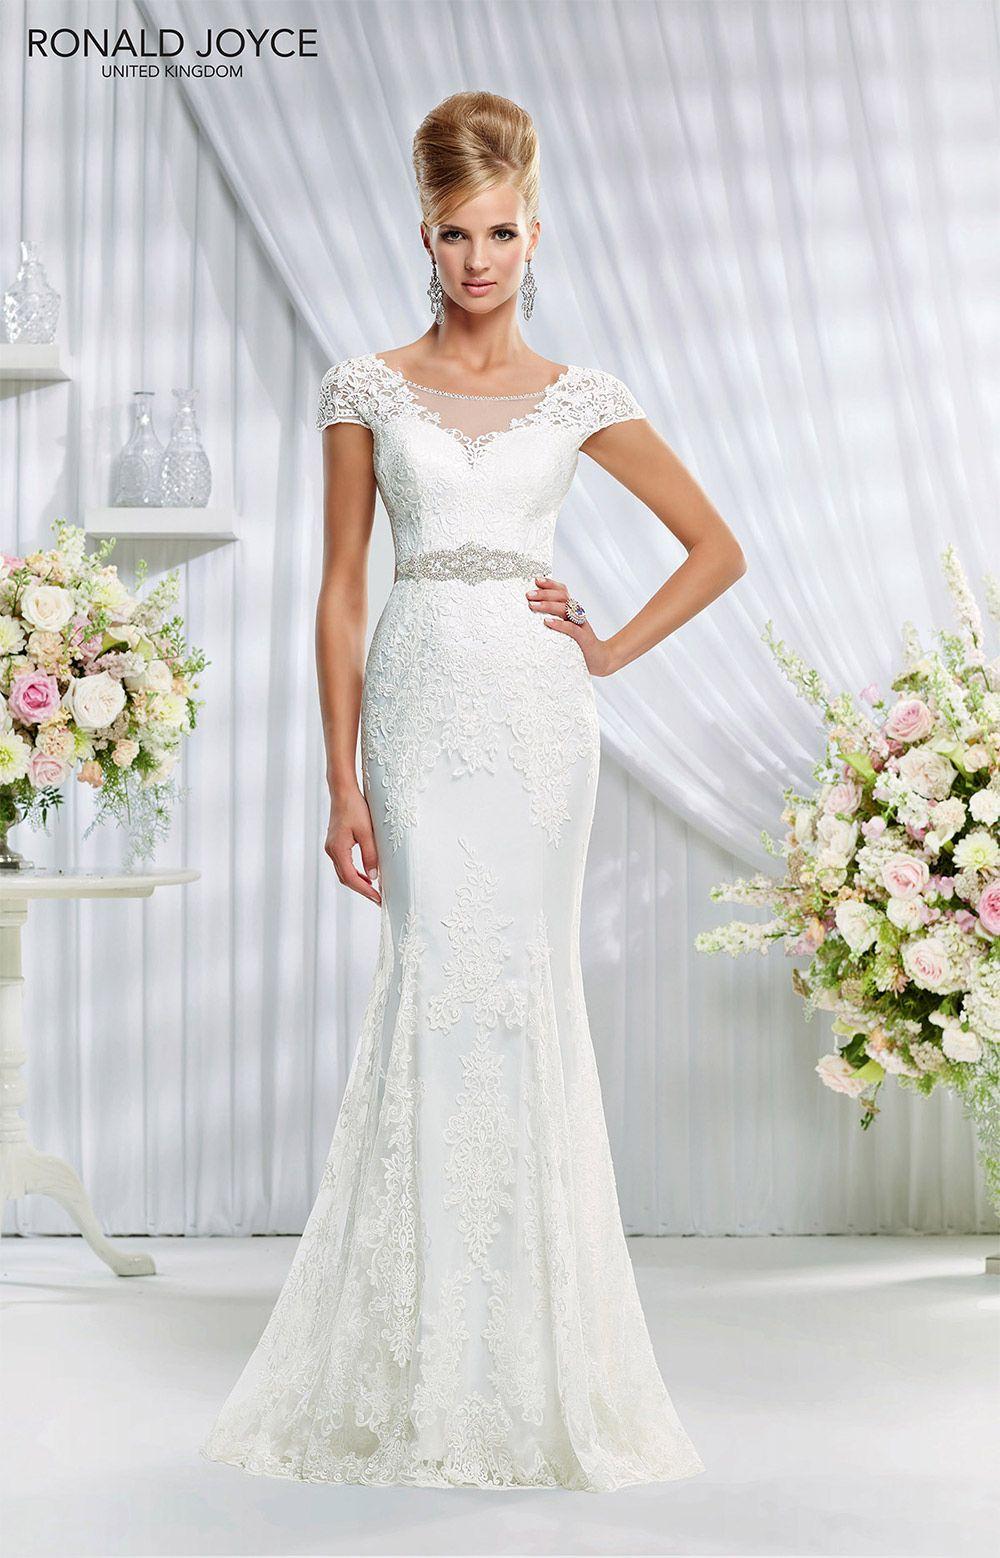 Mature bride wedding dresses  Wedding Dresses for the Mature Bride  Cute Dresses for A Wedding